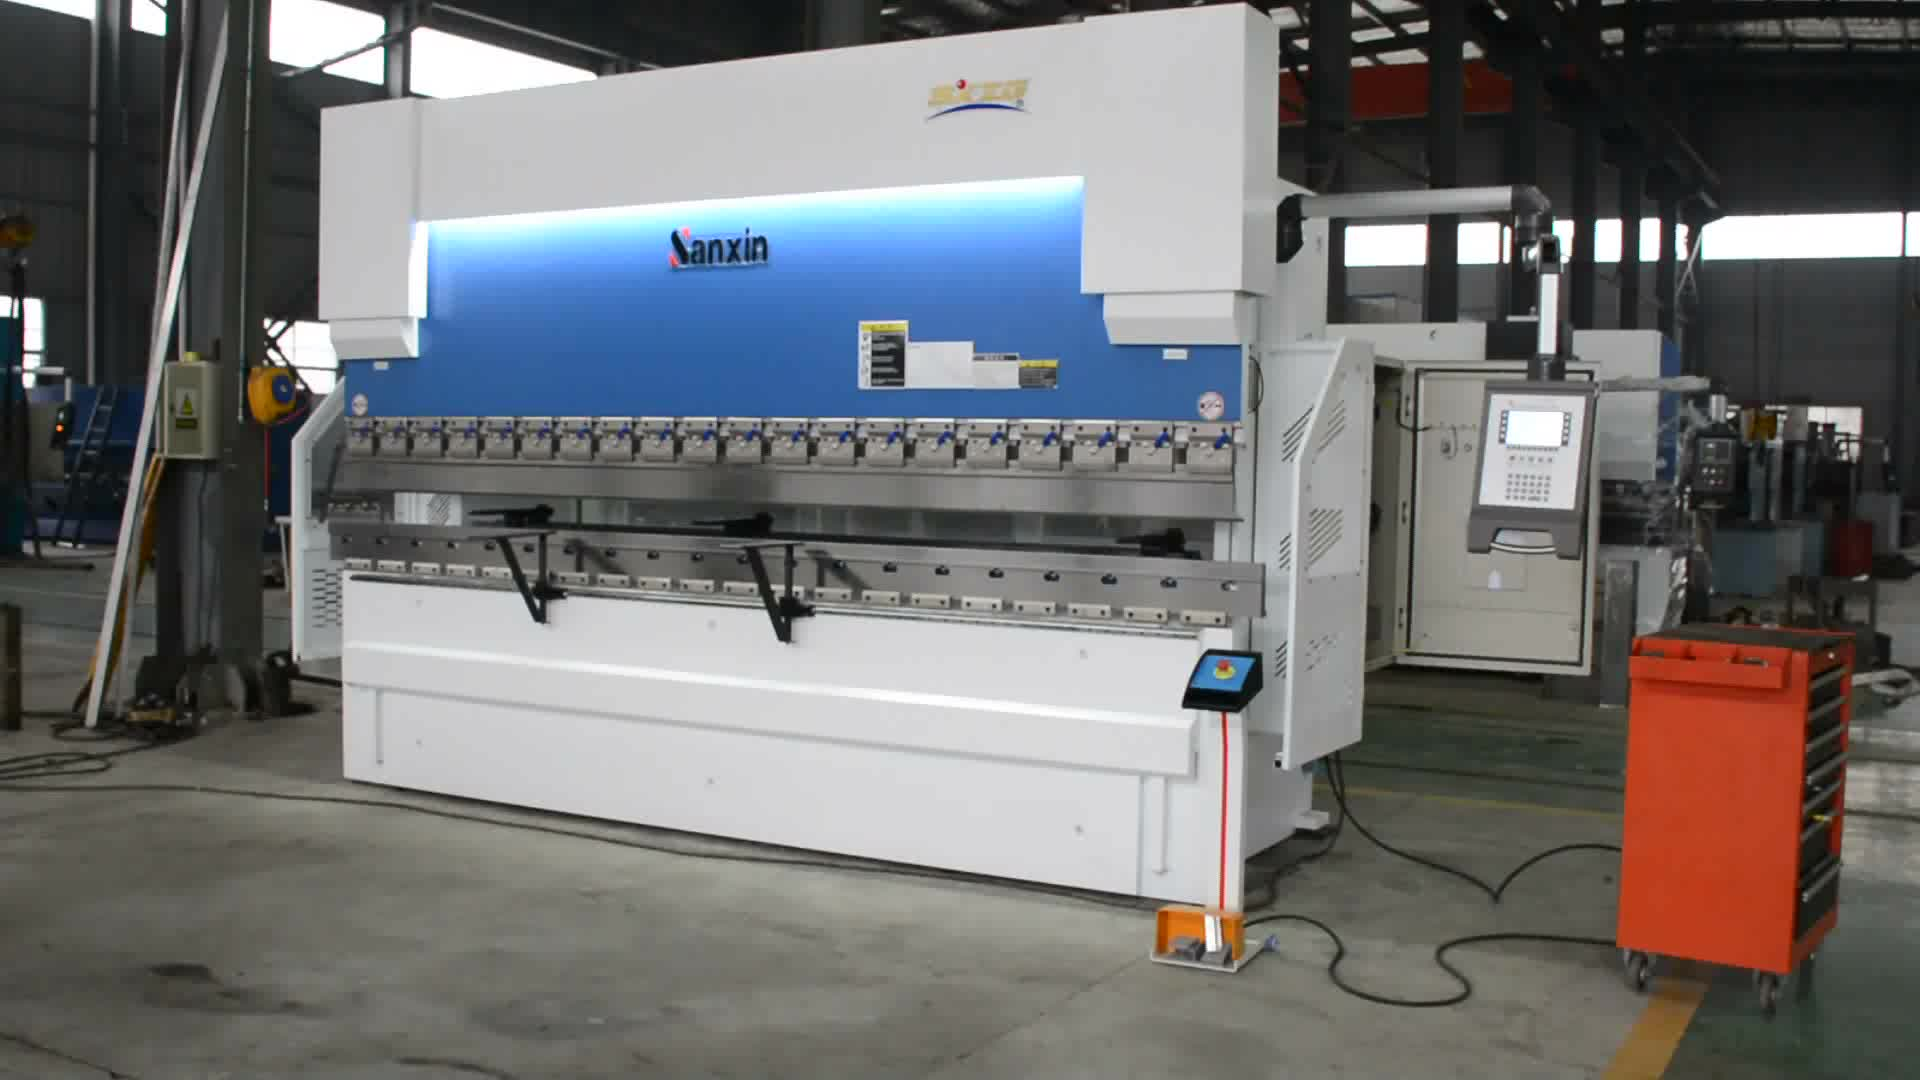 SXZG Marka CNC Hidrolik Pres Fren WC67K-100T / 3200, 2015 ÜST CNC Hidrolik bükme makinesi / pres fren fiyat